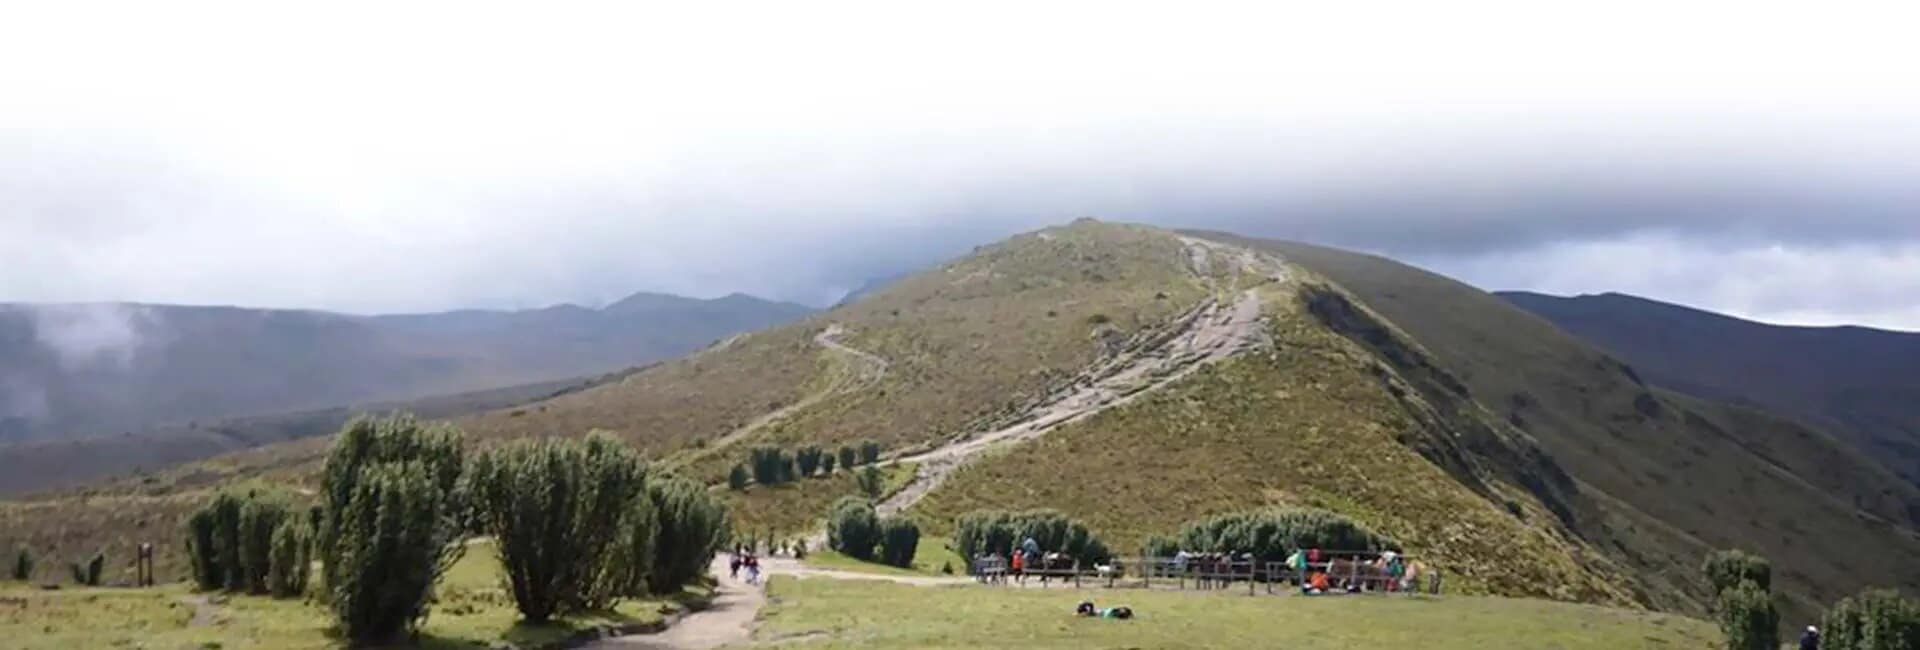 trail to rucu pichincha quito ecuador